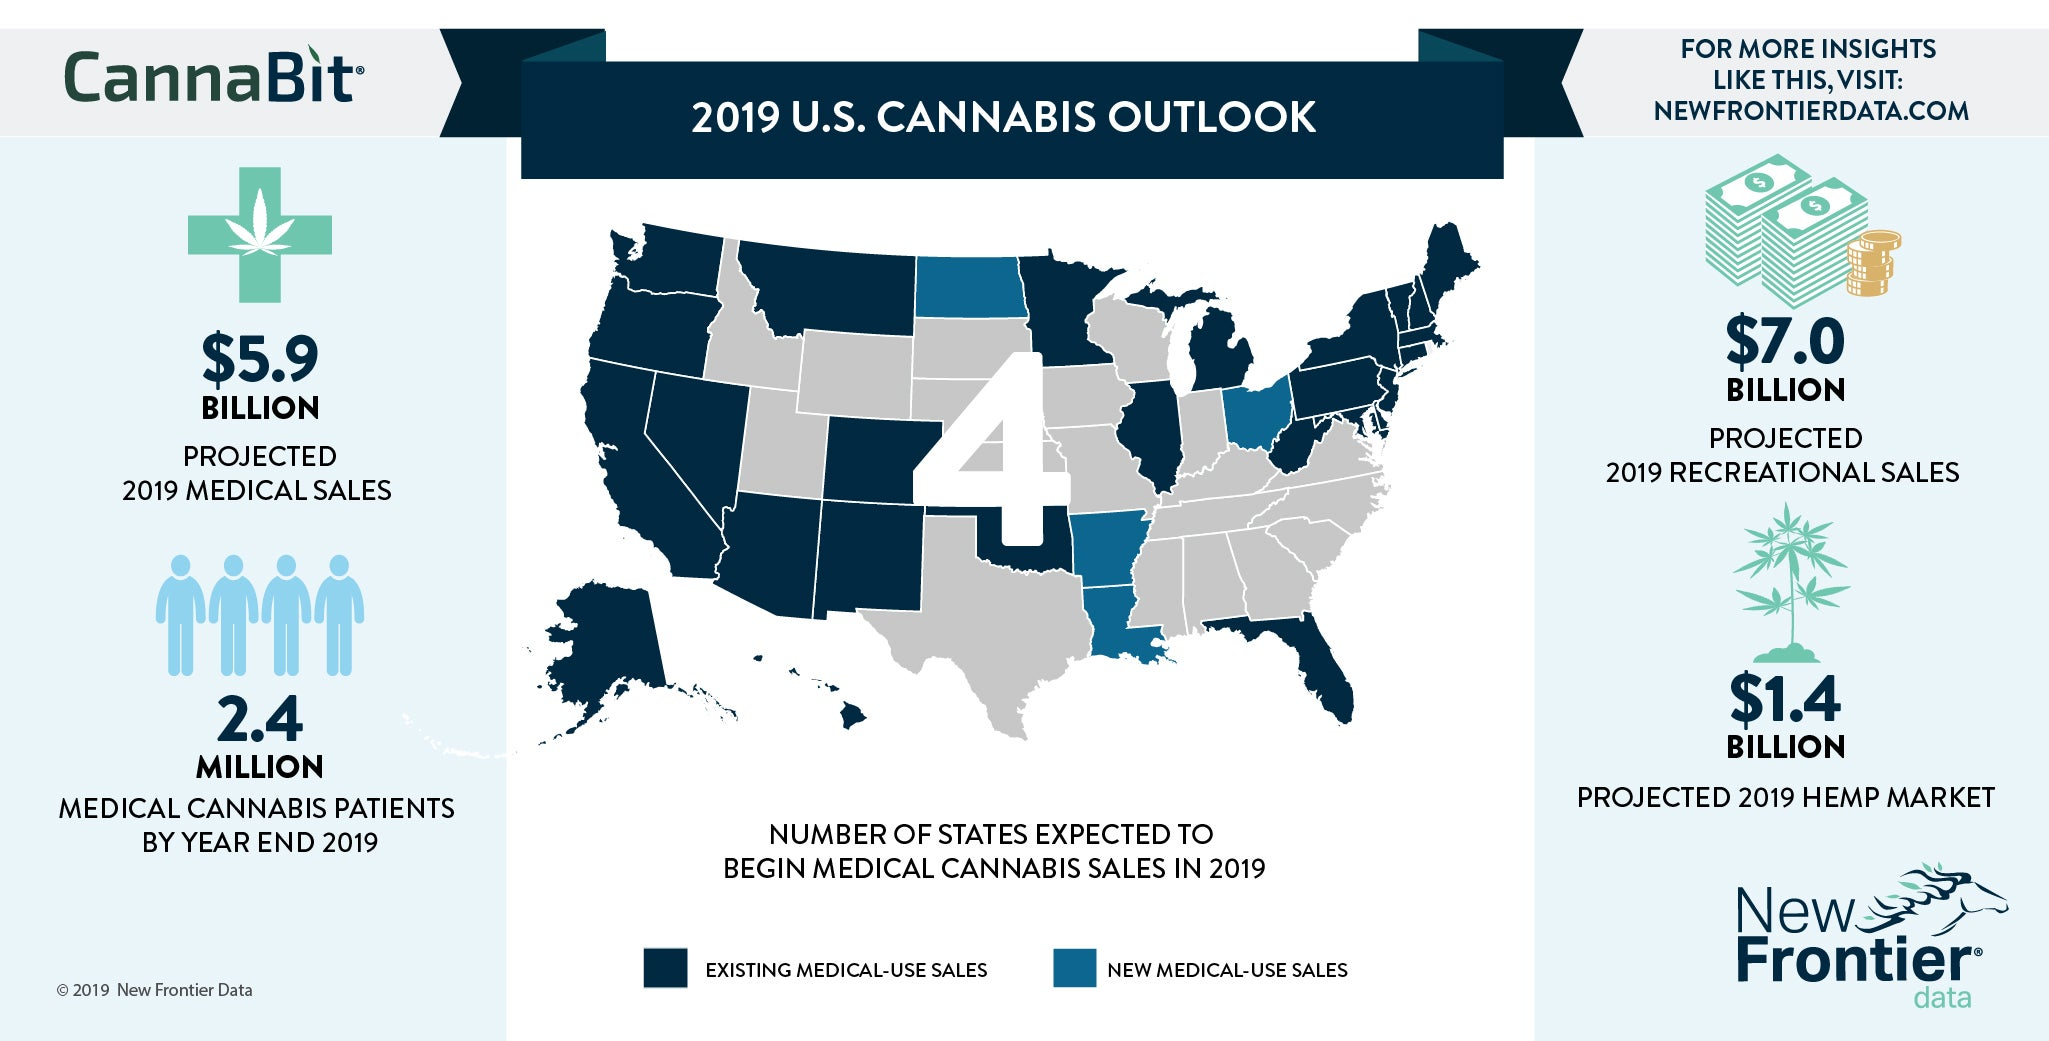 1-4-2019-cannabit-infographic.jpg